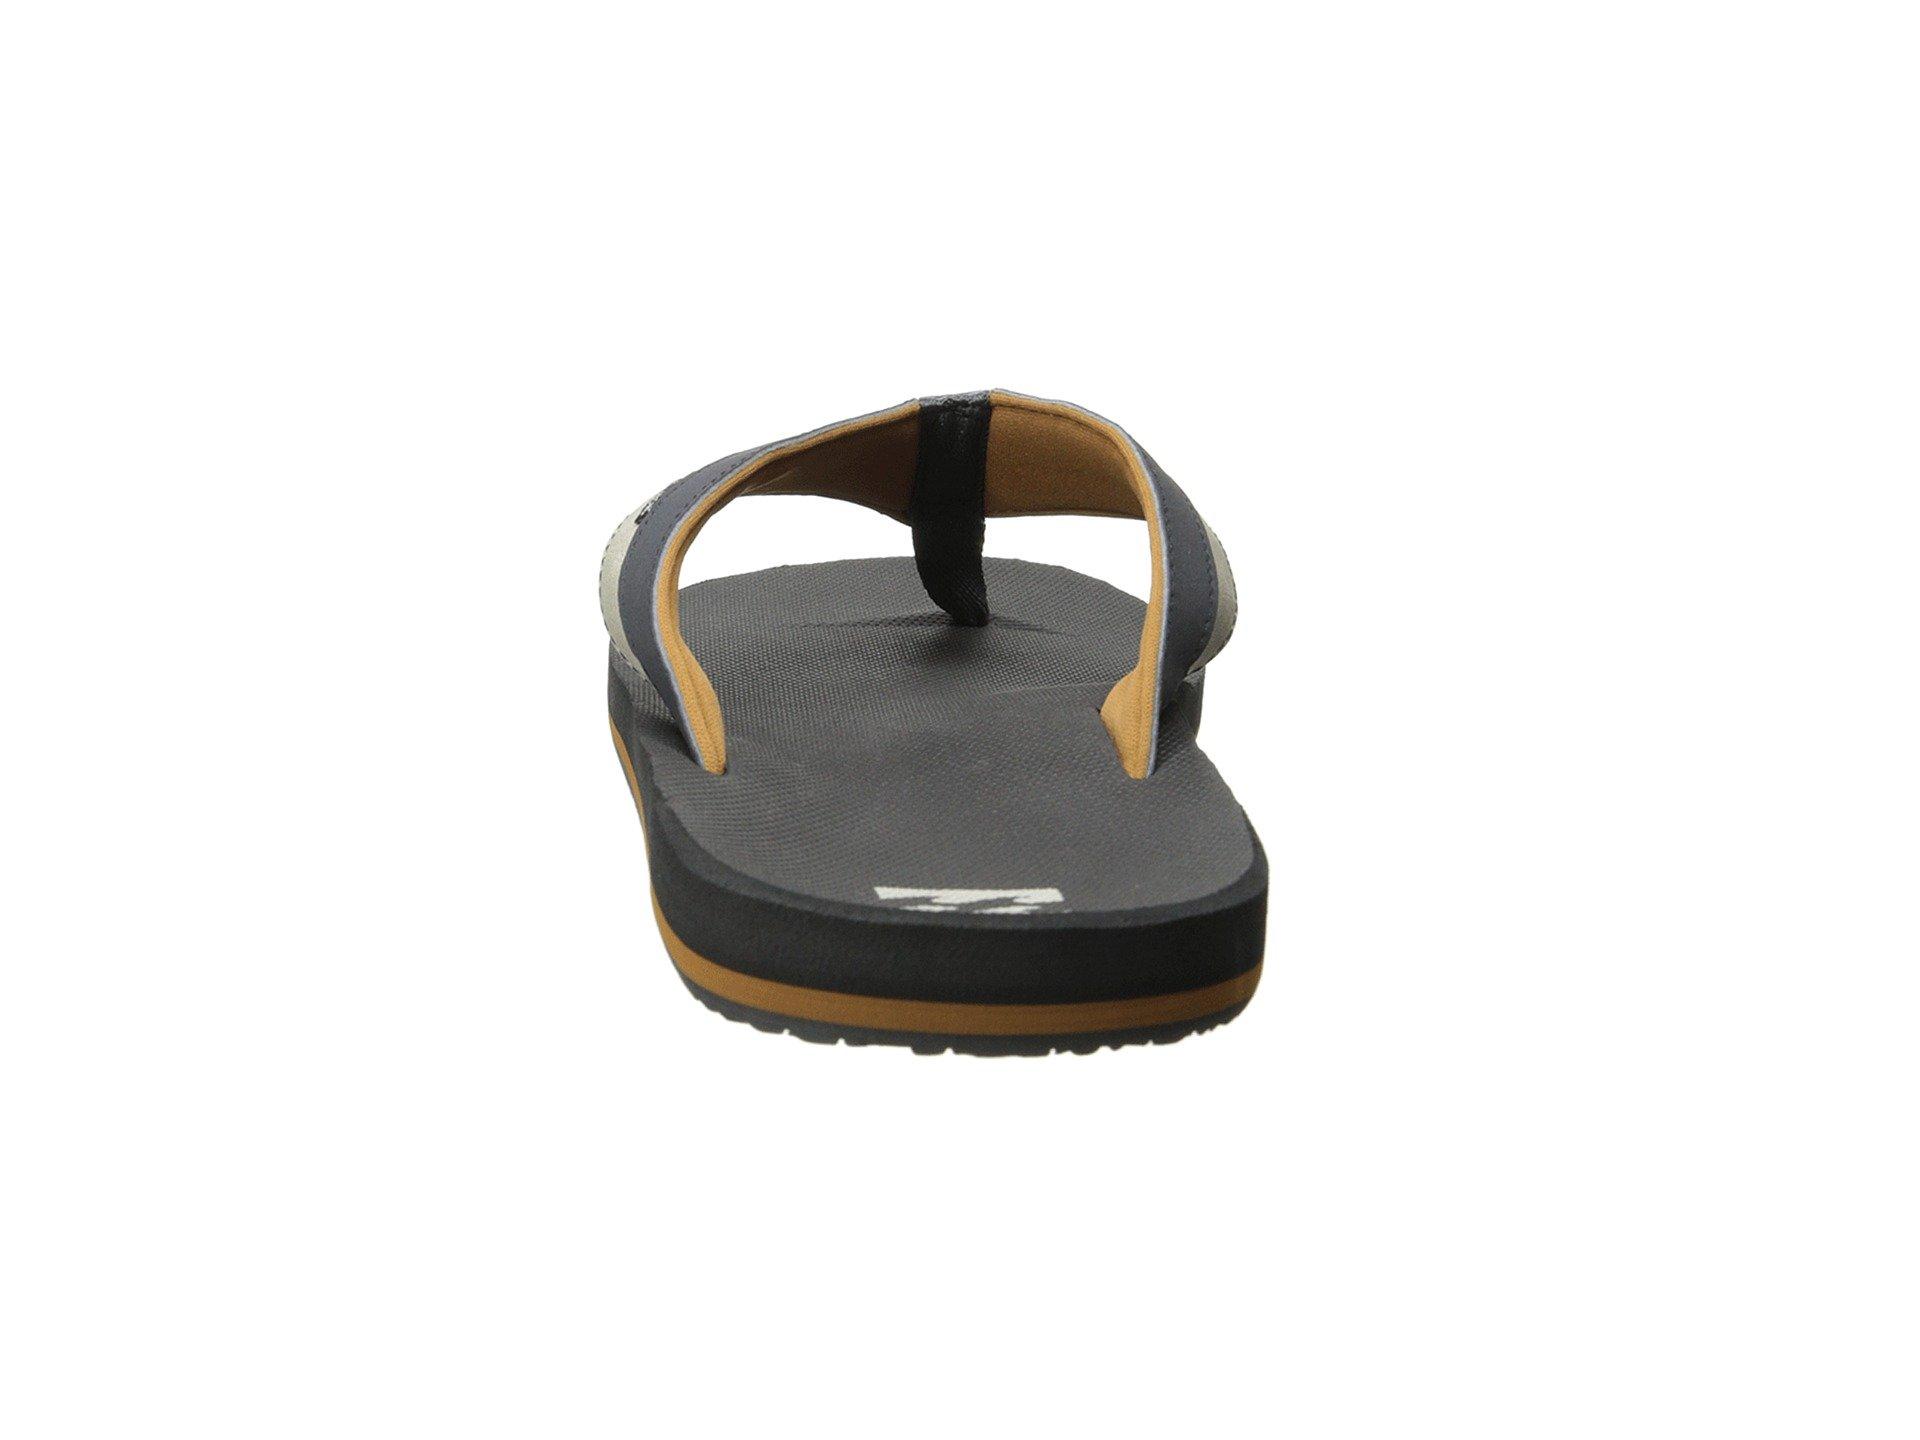 Billabong Charcoal Sandal Day Impact All q7IrwtIH